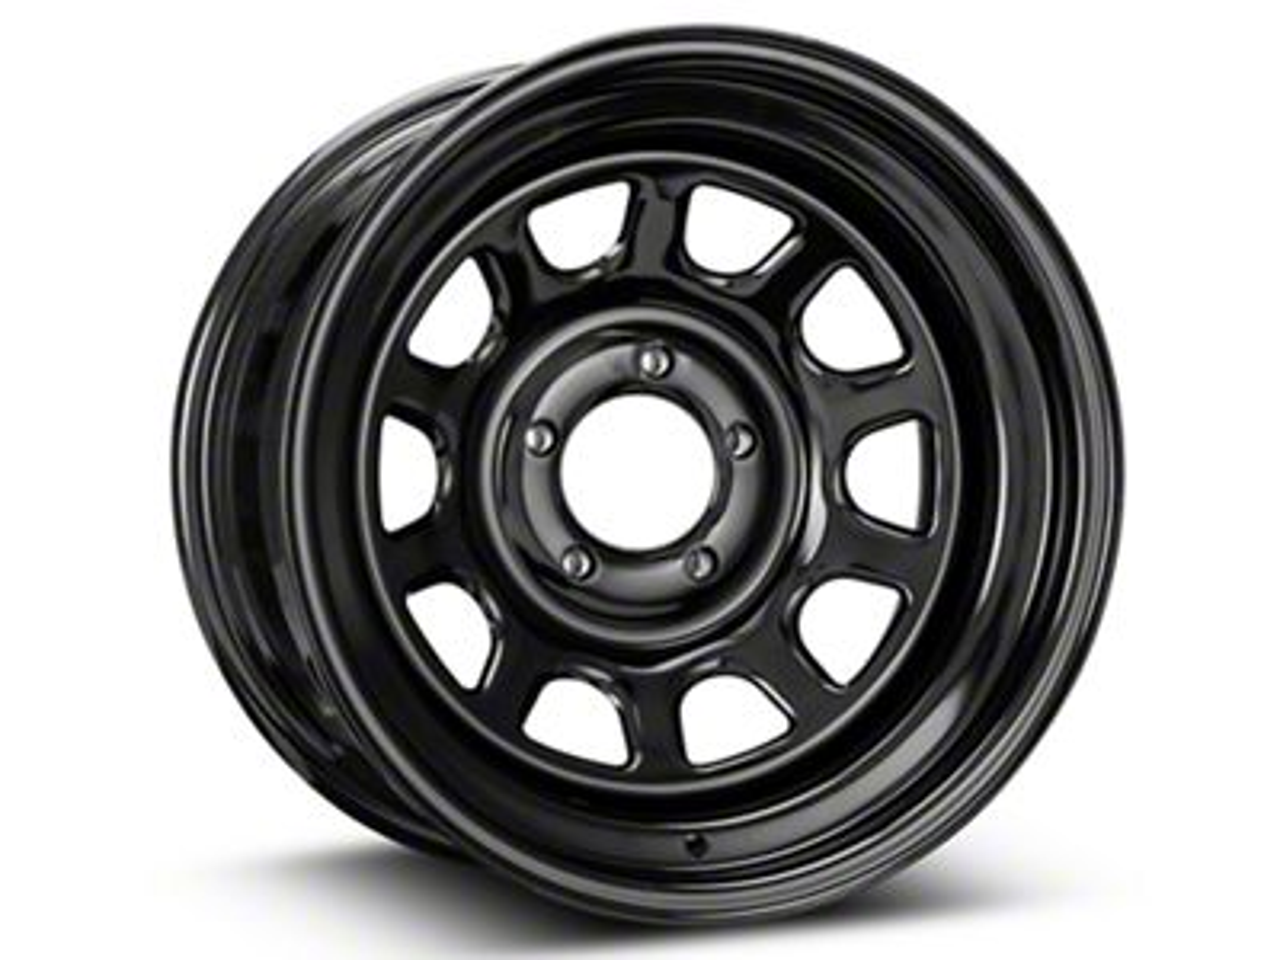 Pro Comp Wheels Steel Series 52 Rock Crawler Gloss Black Wheel - 16x8 (87-06 Jeep Wrangler YJ & TJ)